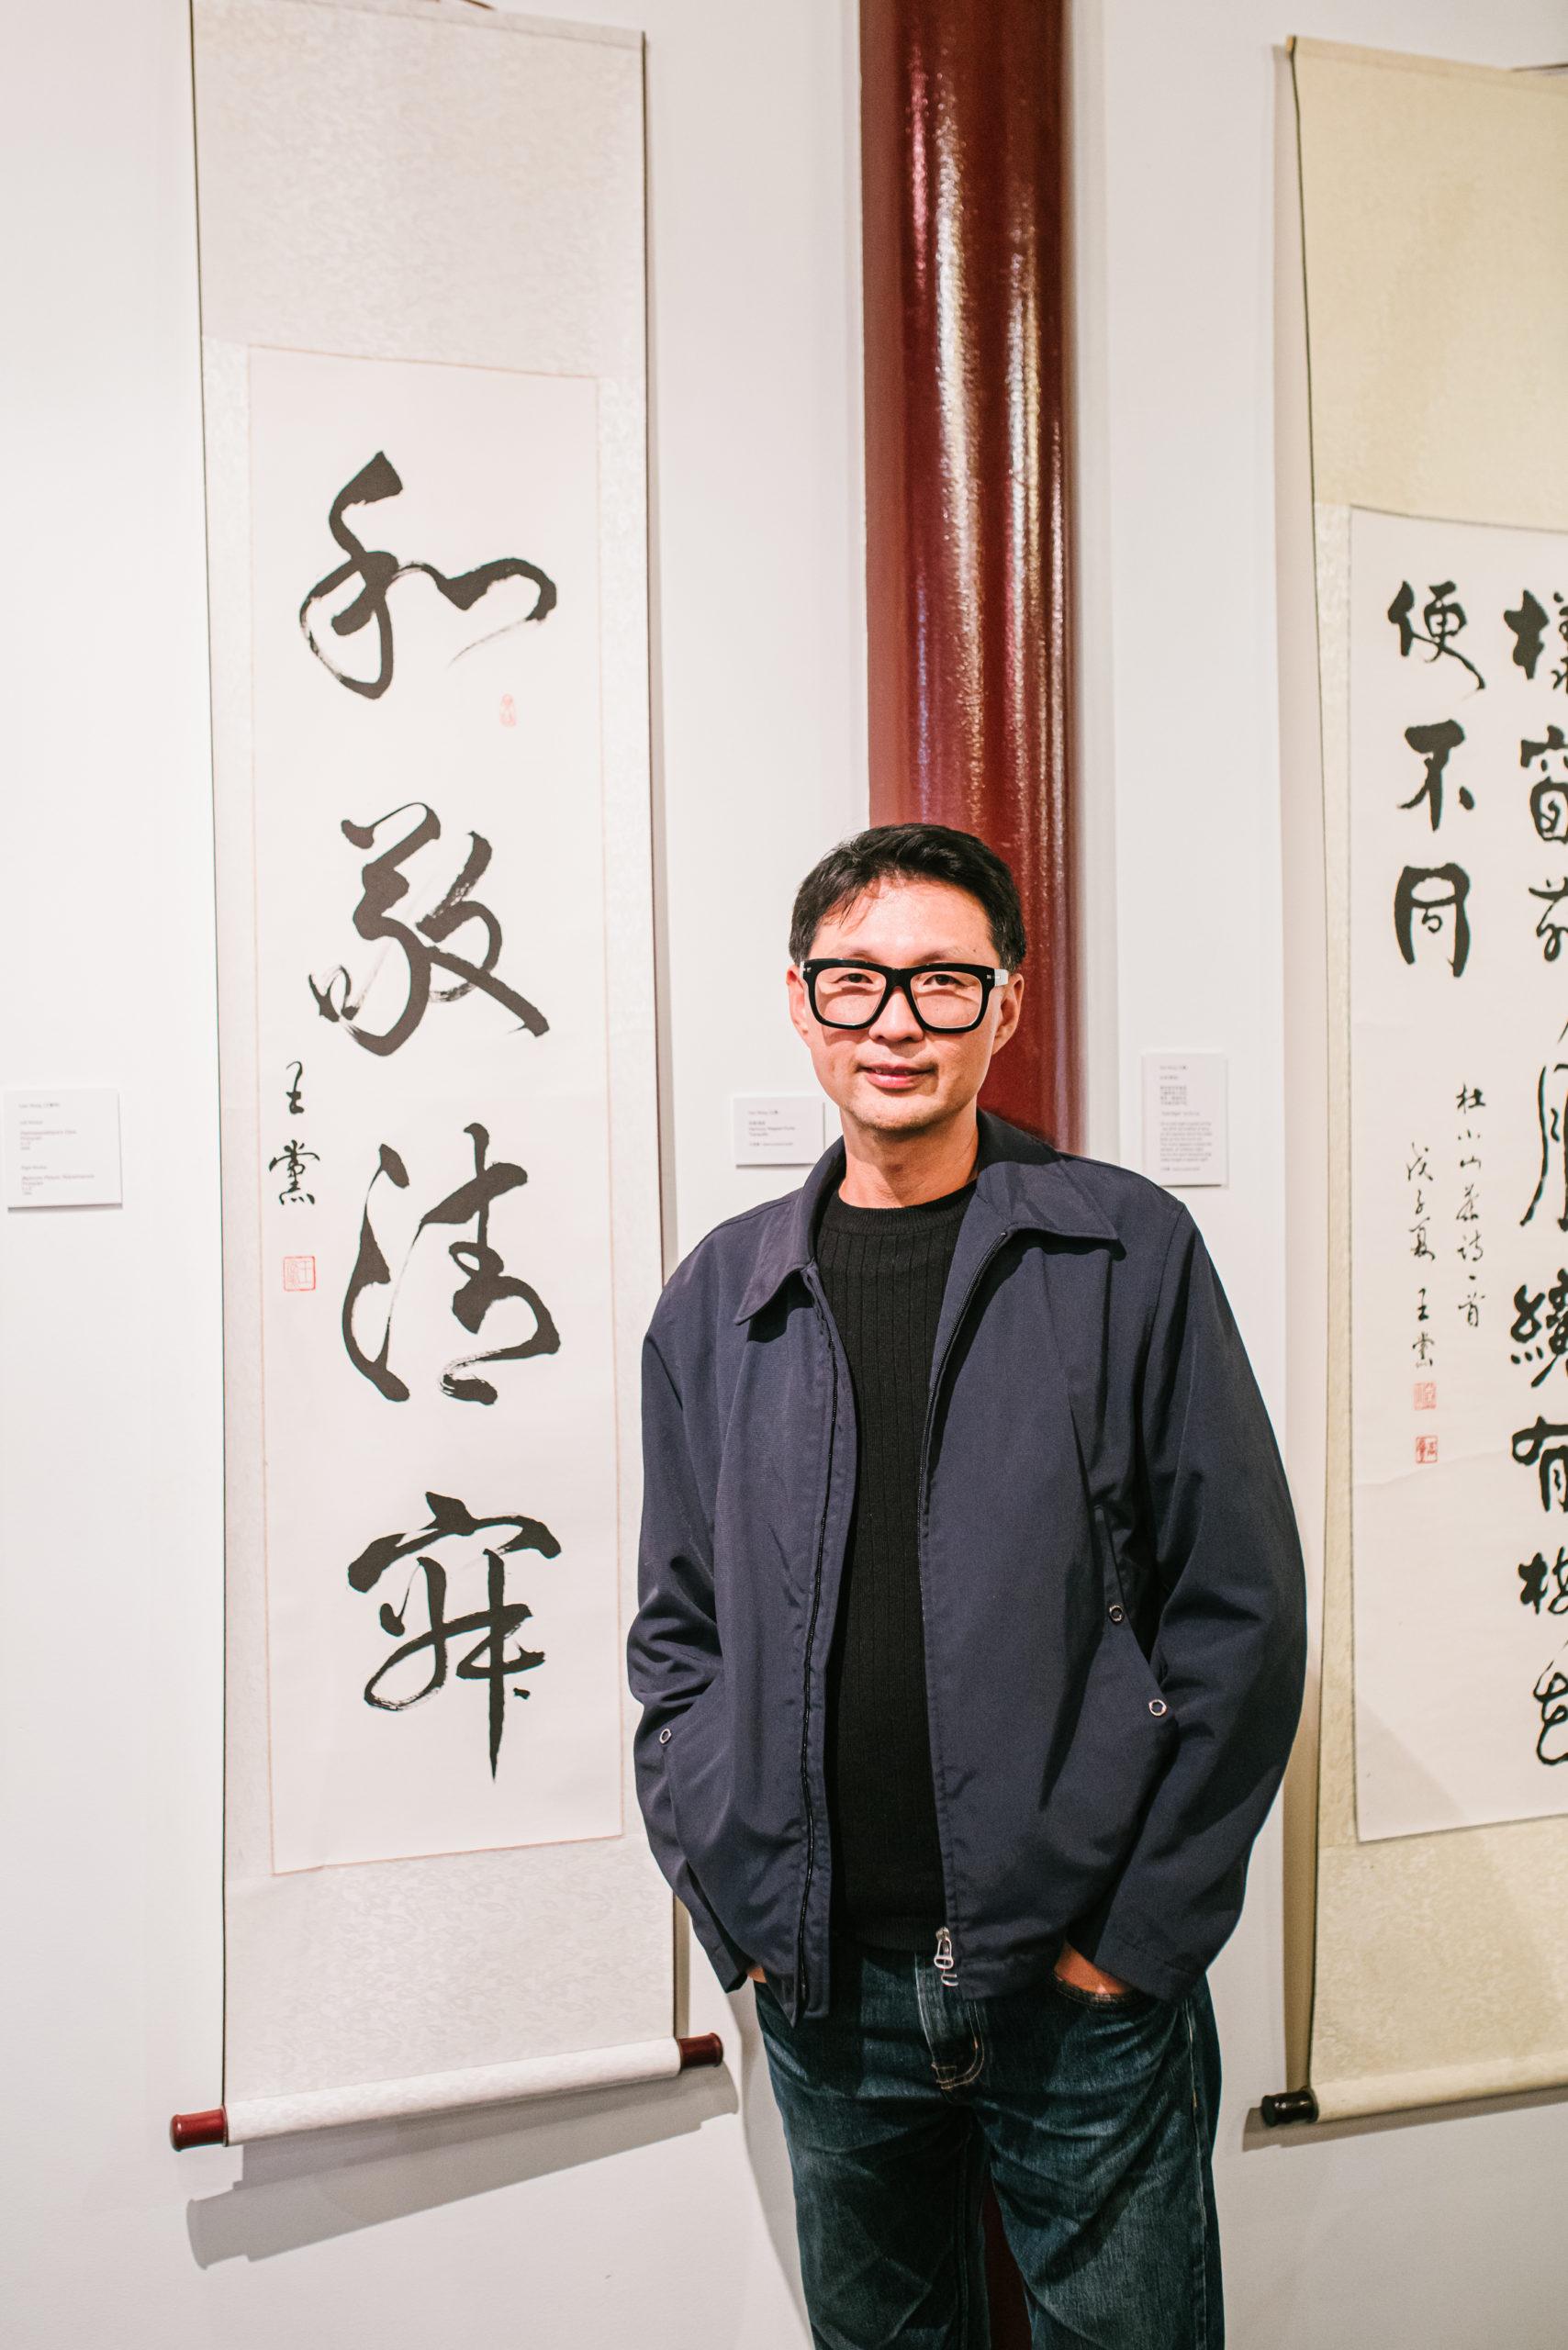 Lam Wong | Credit: William Luk